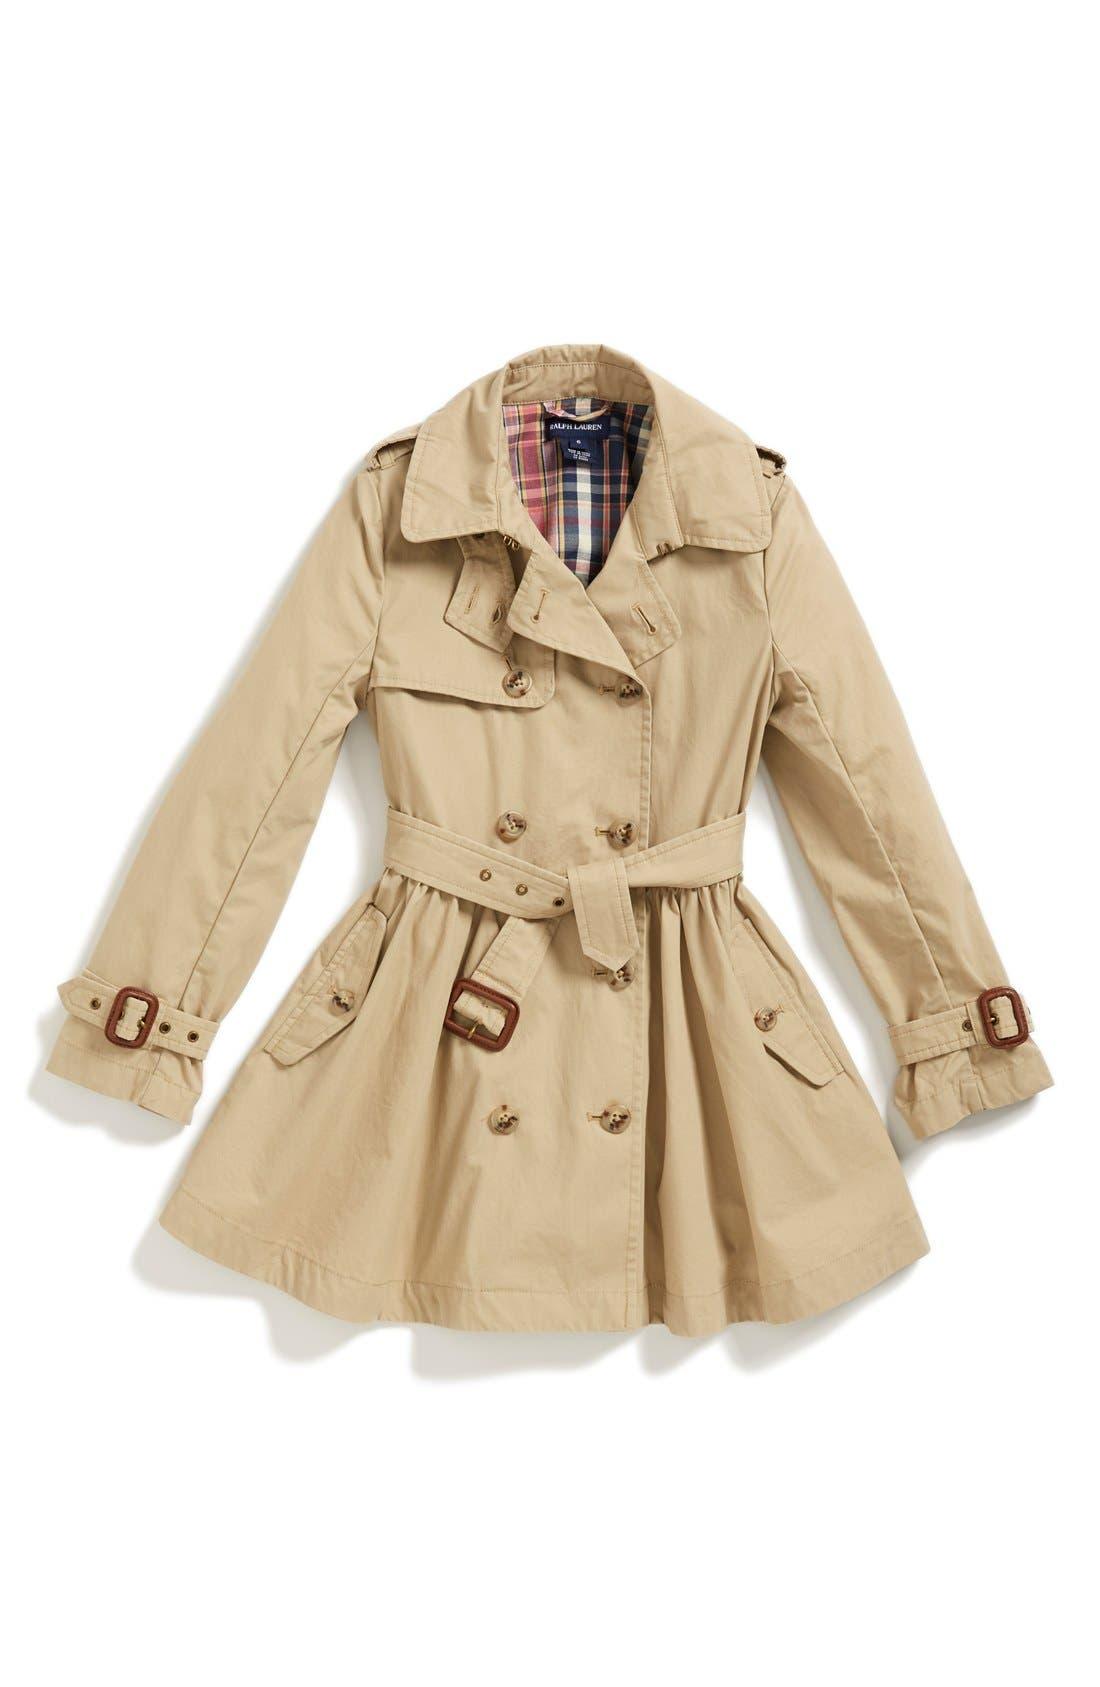 Alternate Image 1 Selected - Ralph Lauren Trench Coat (Little Girls)